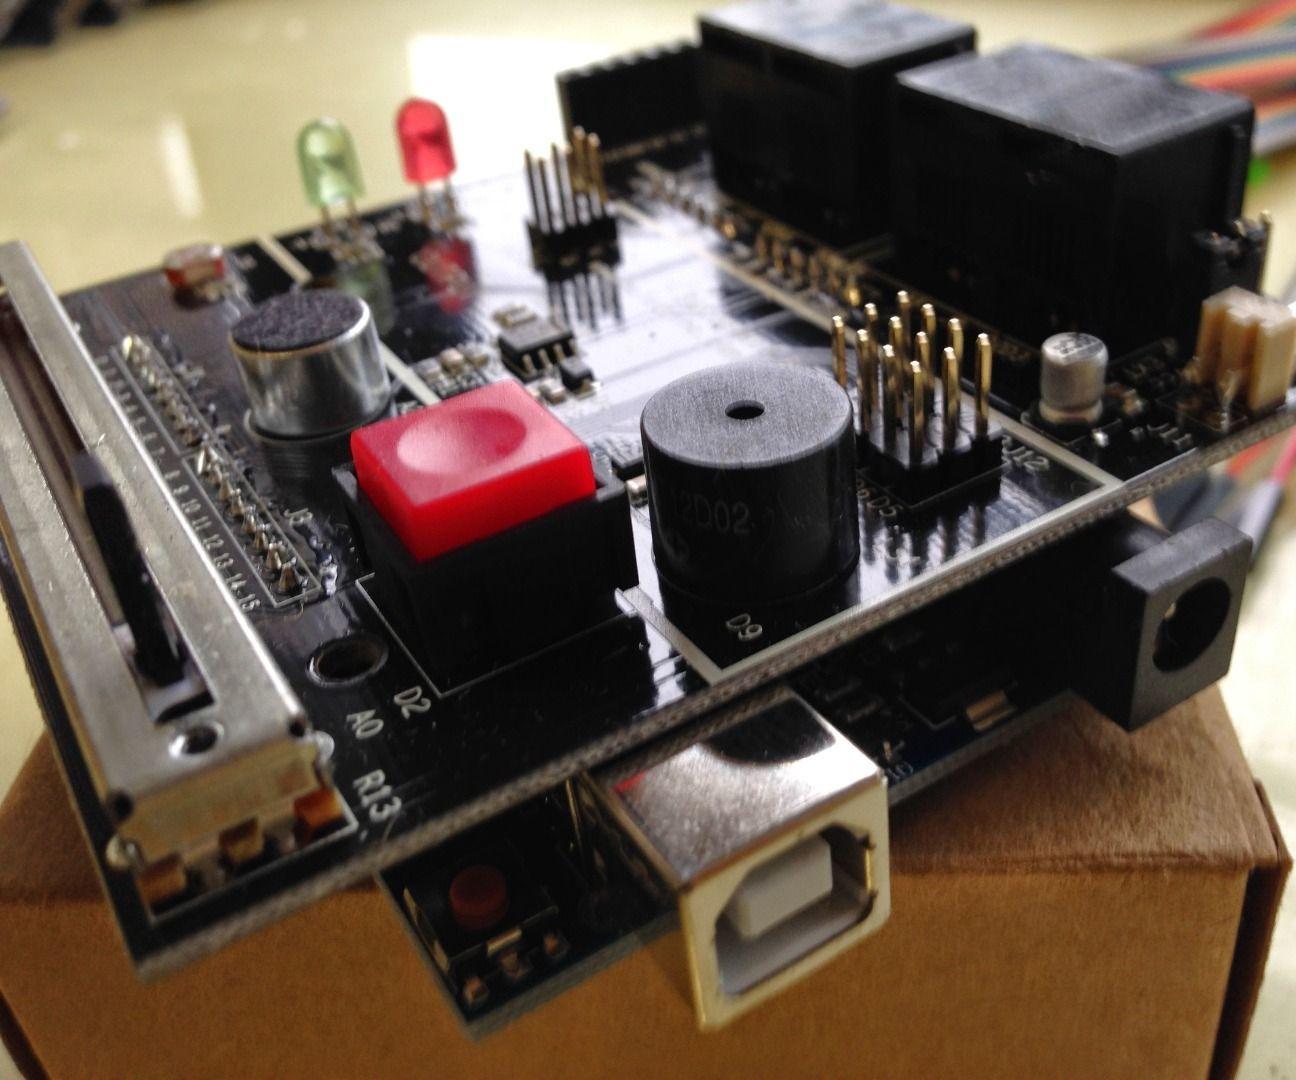 用S4A Sensor Board玩Scratch 2.0